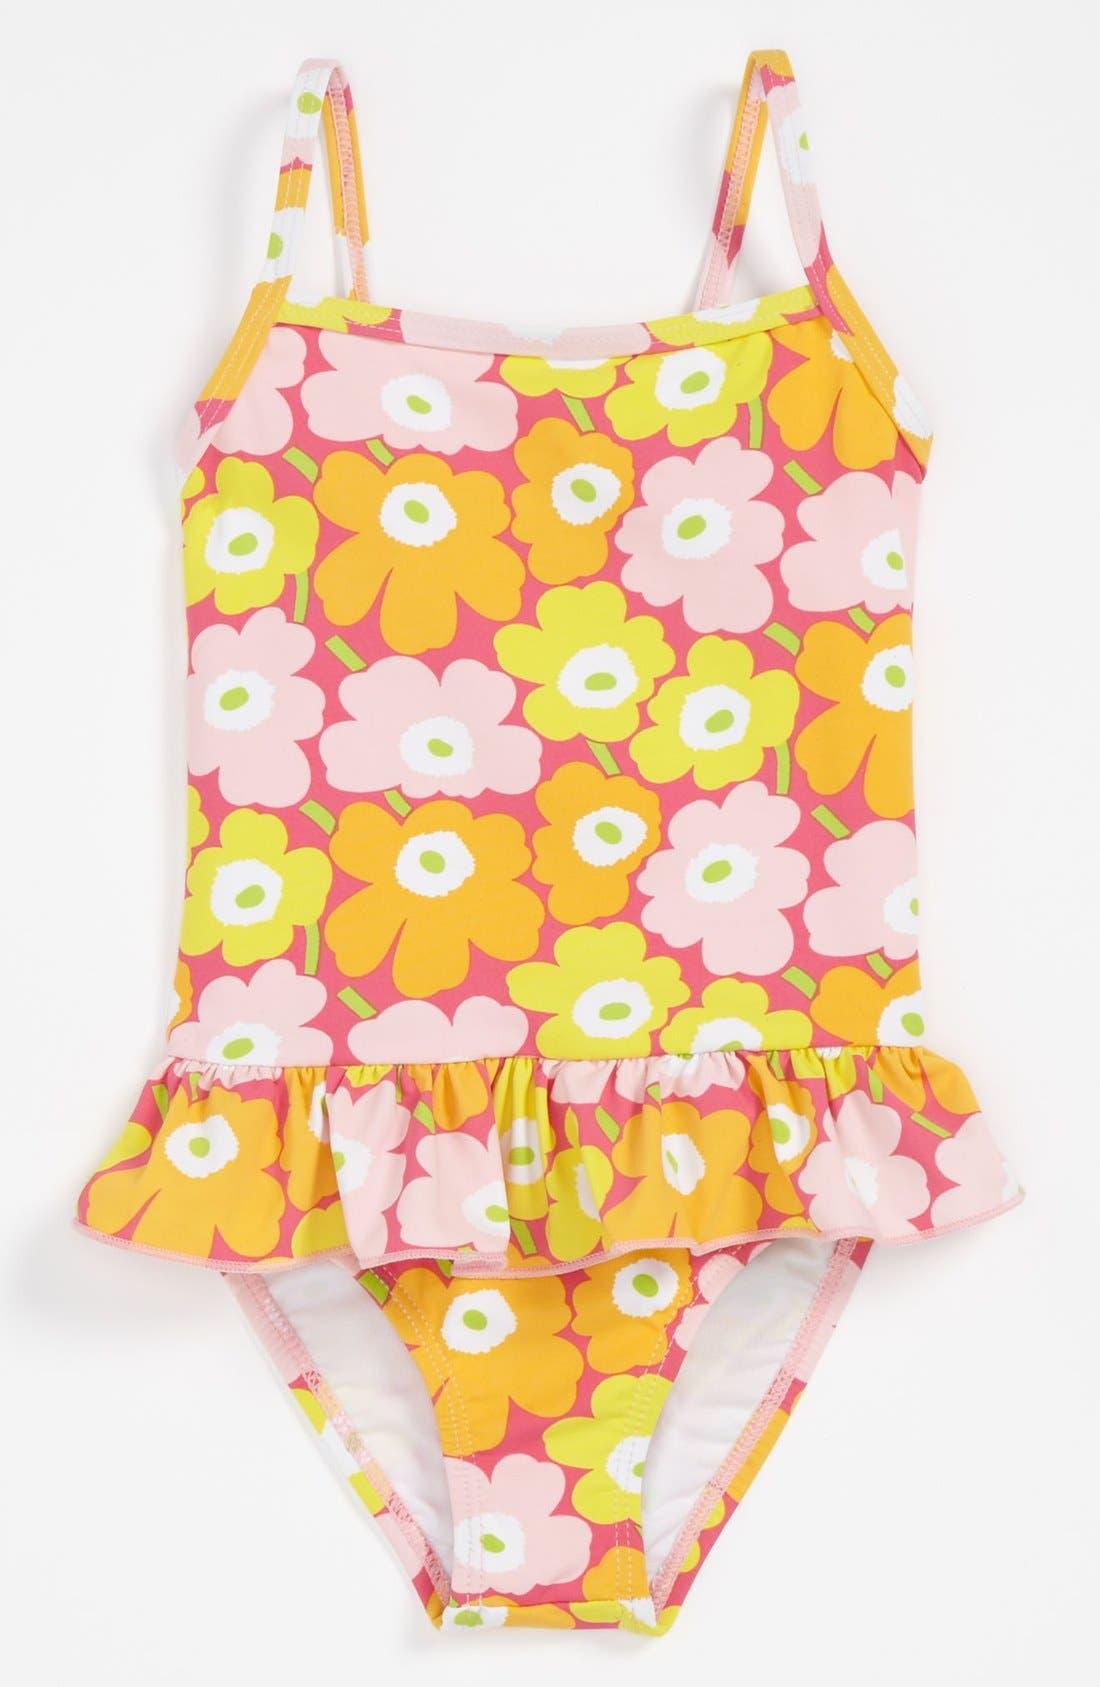 Alternate Image 1 Selected - Marimekko One Piece Swimsuit (Baby)